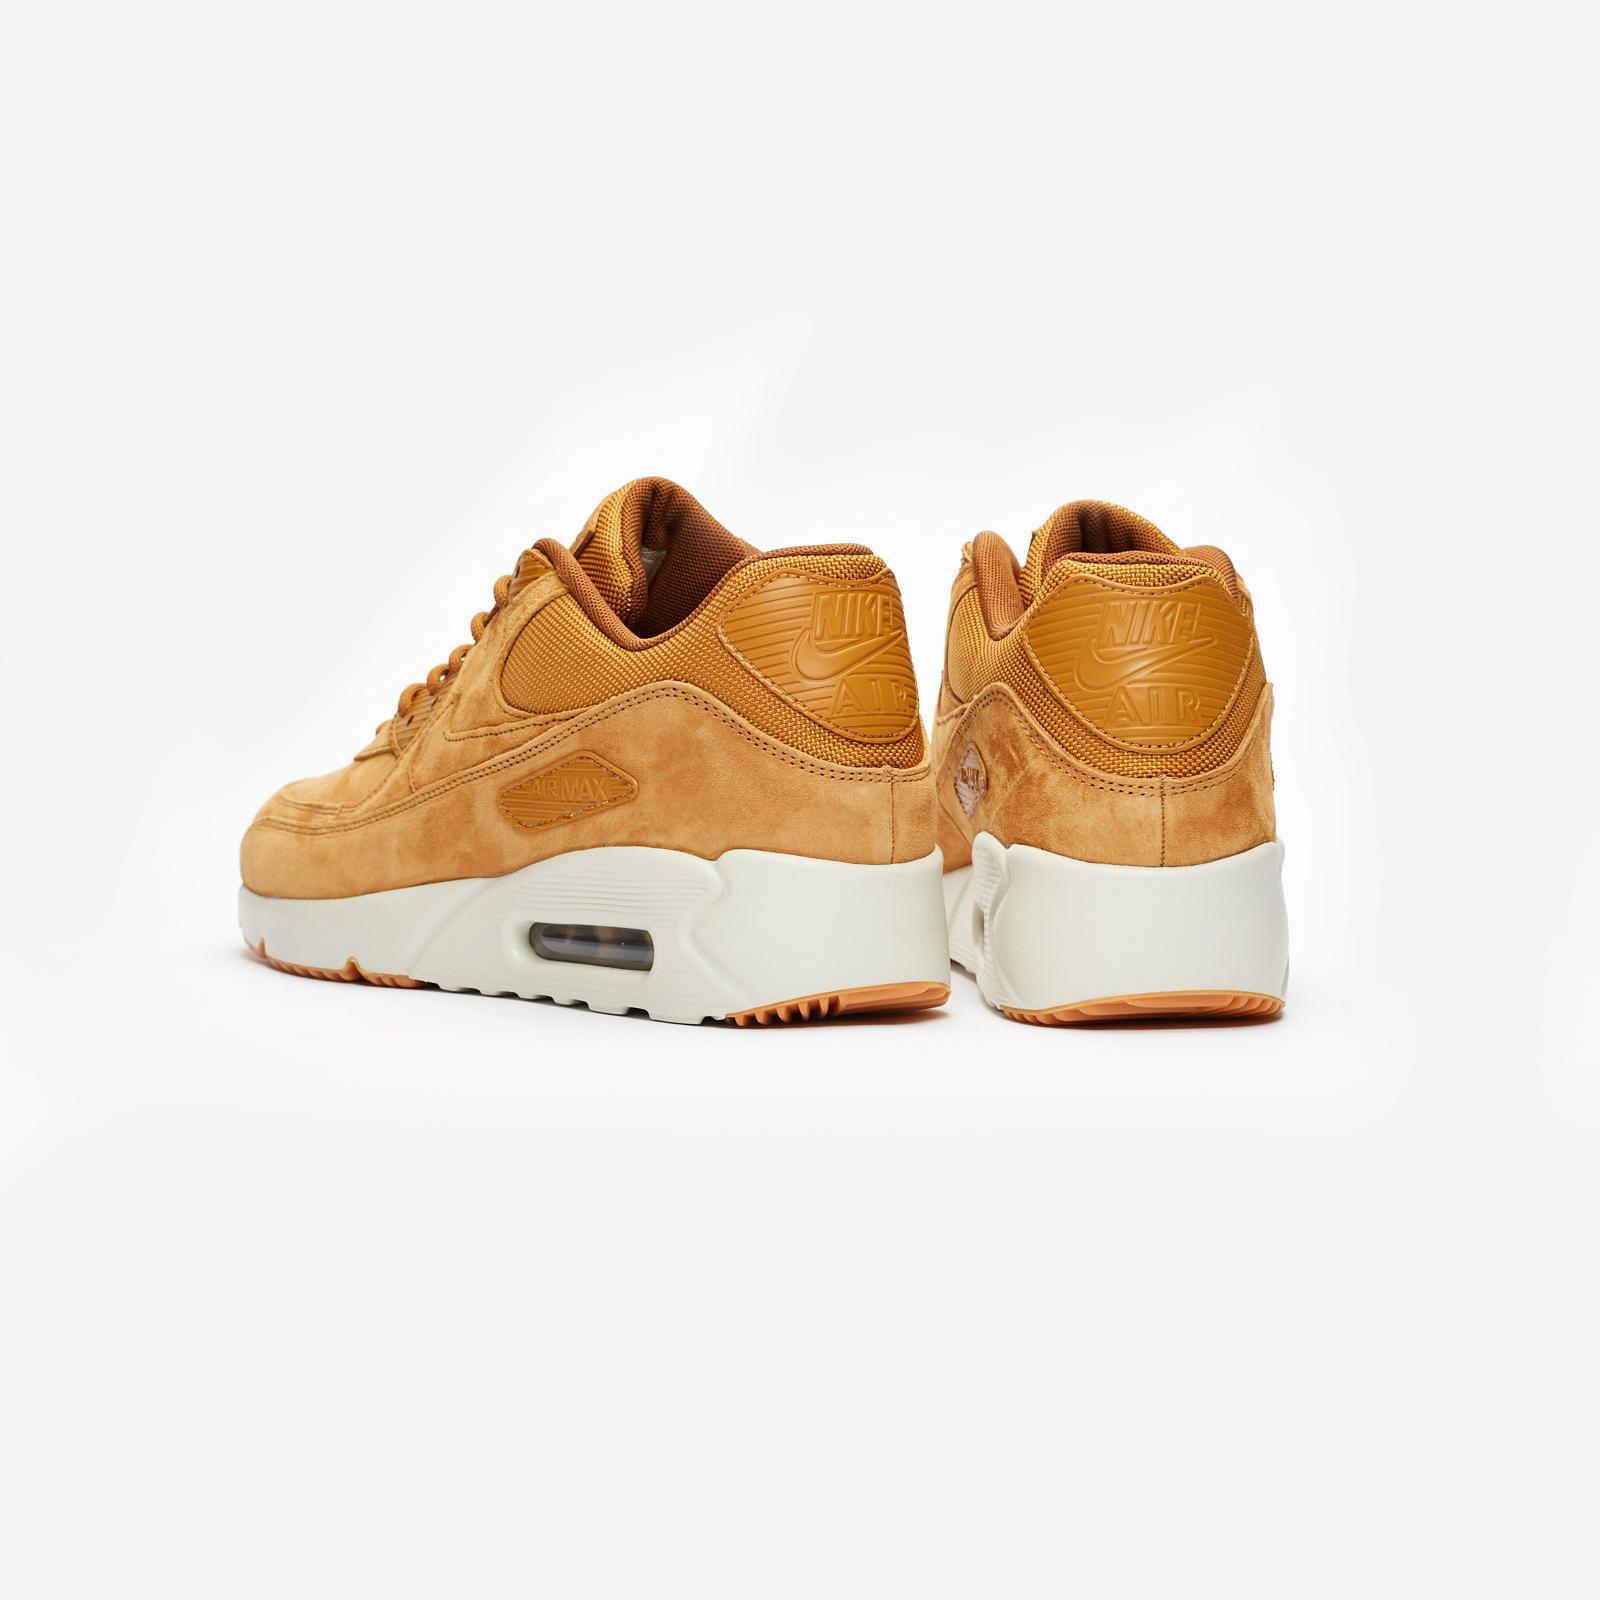 Nike Air Max 90 Ultra 2.0 LTR - 924447-700 - SNS   sneakers ...